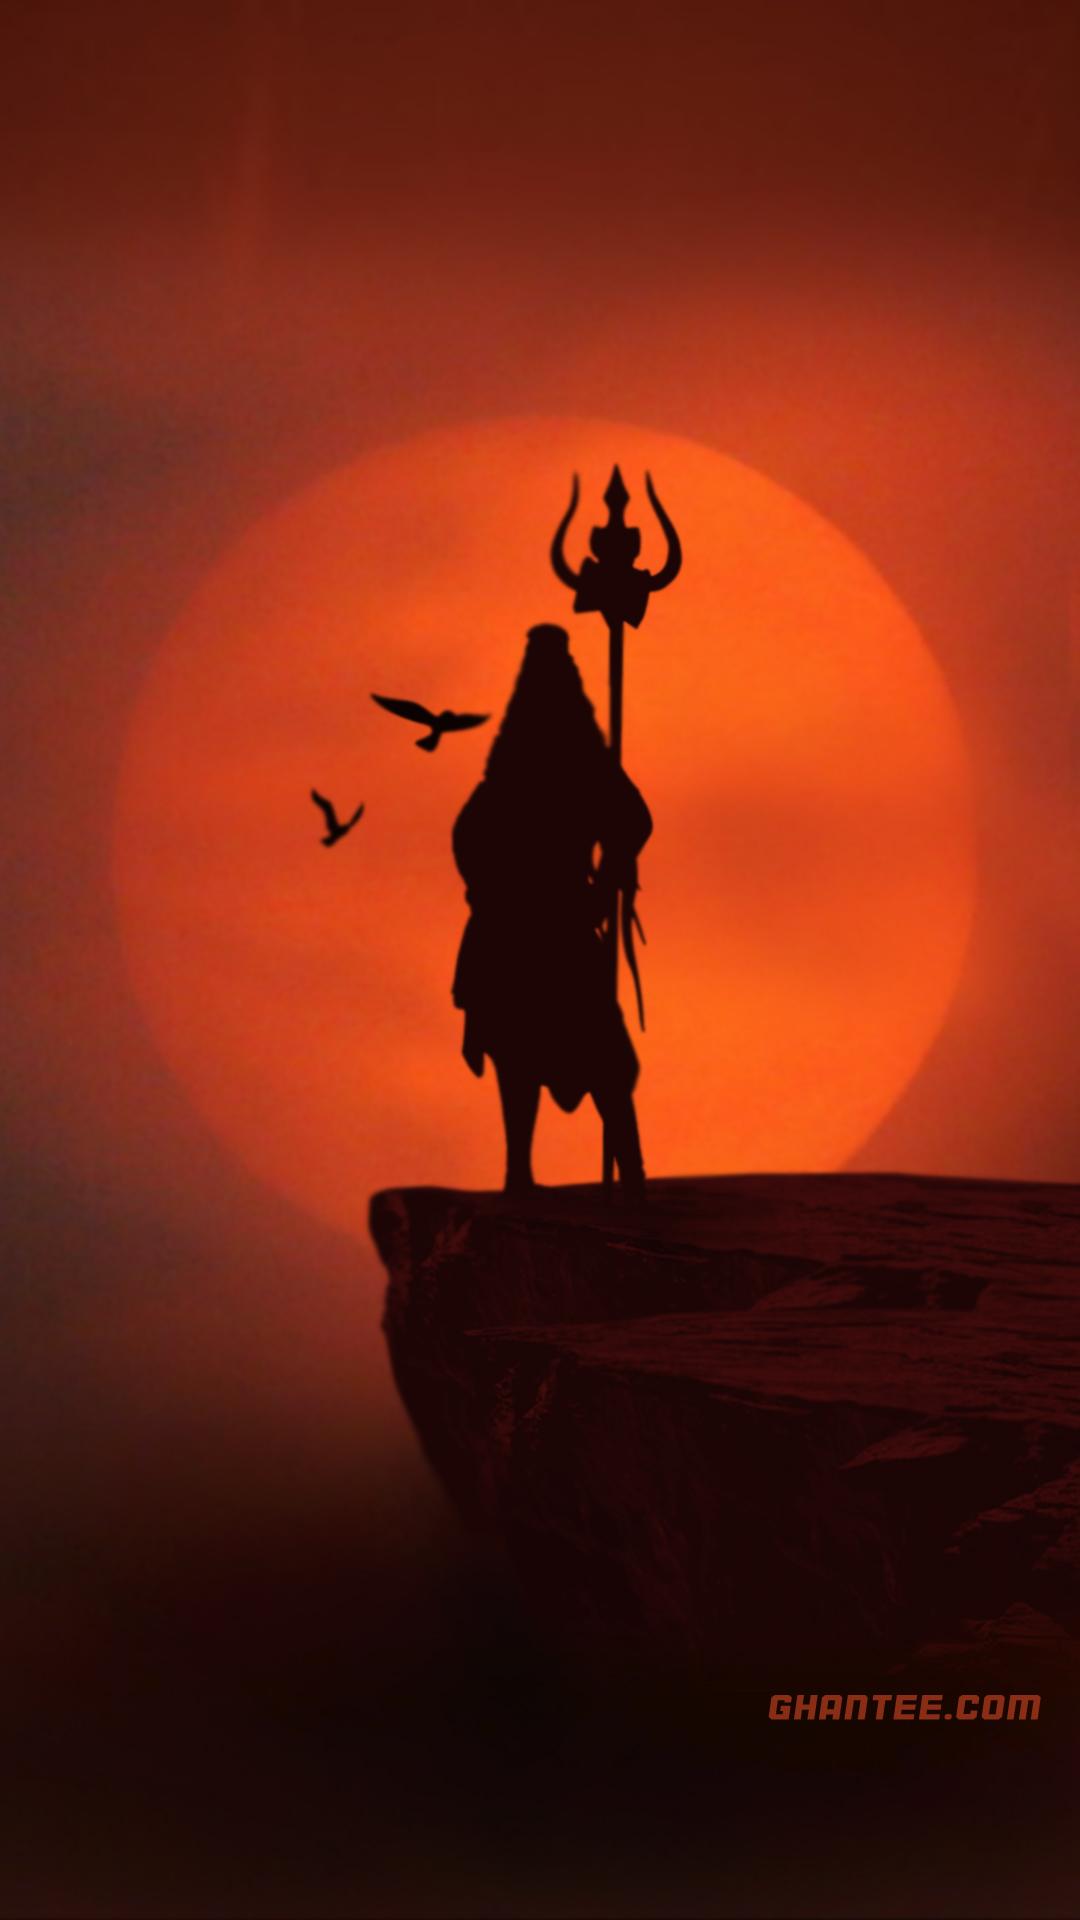 mahadev image orange sunset silhouette